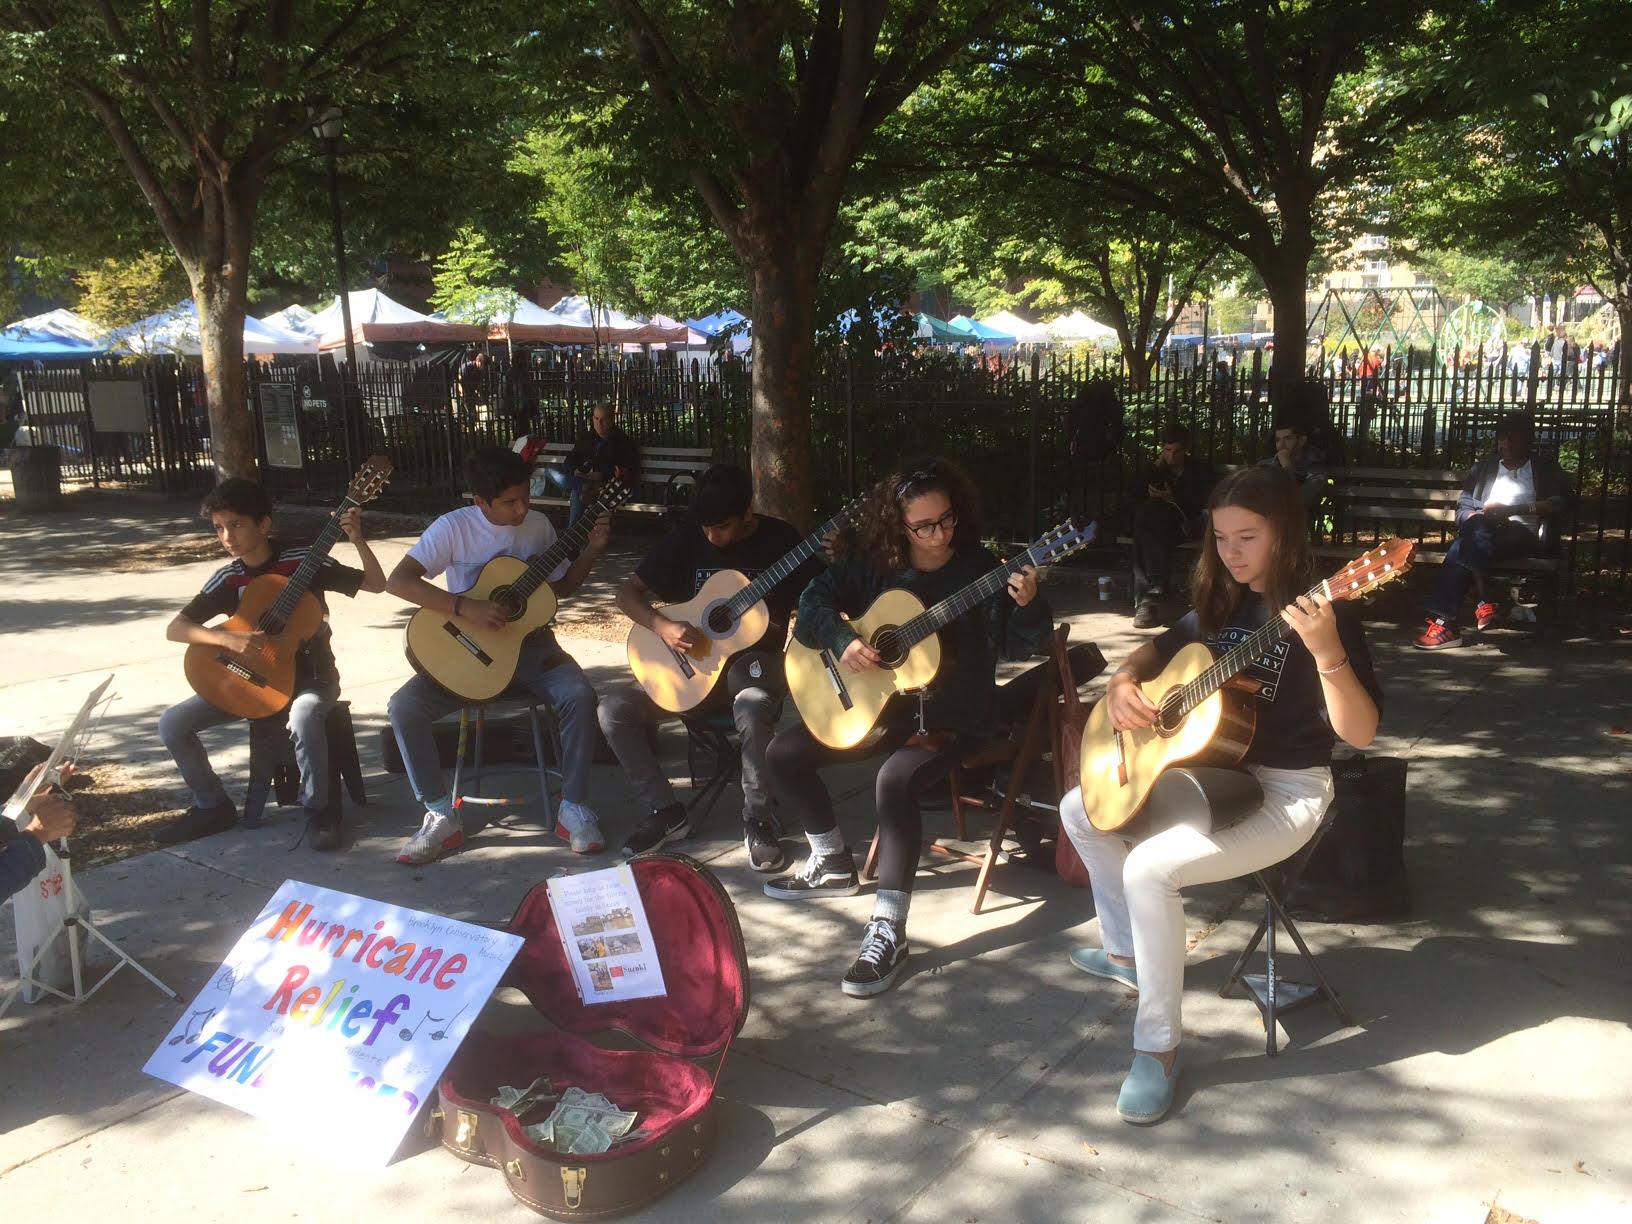 Guitar students